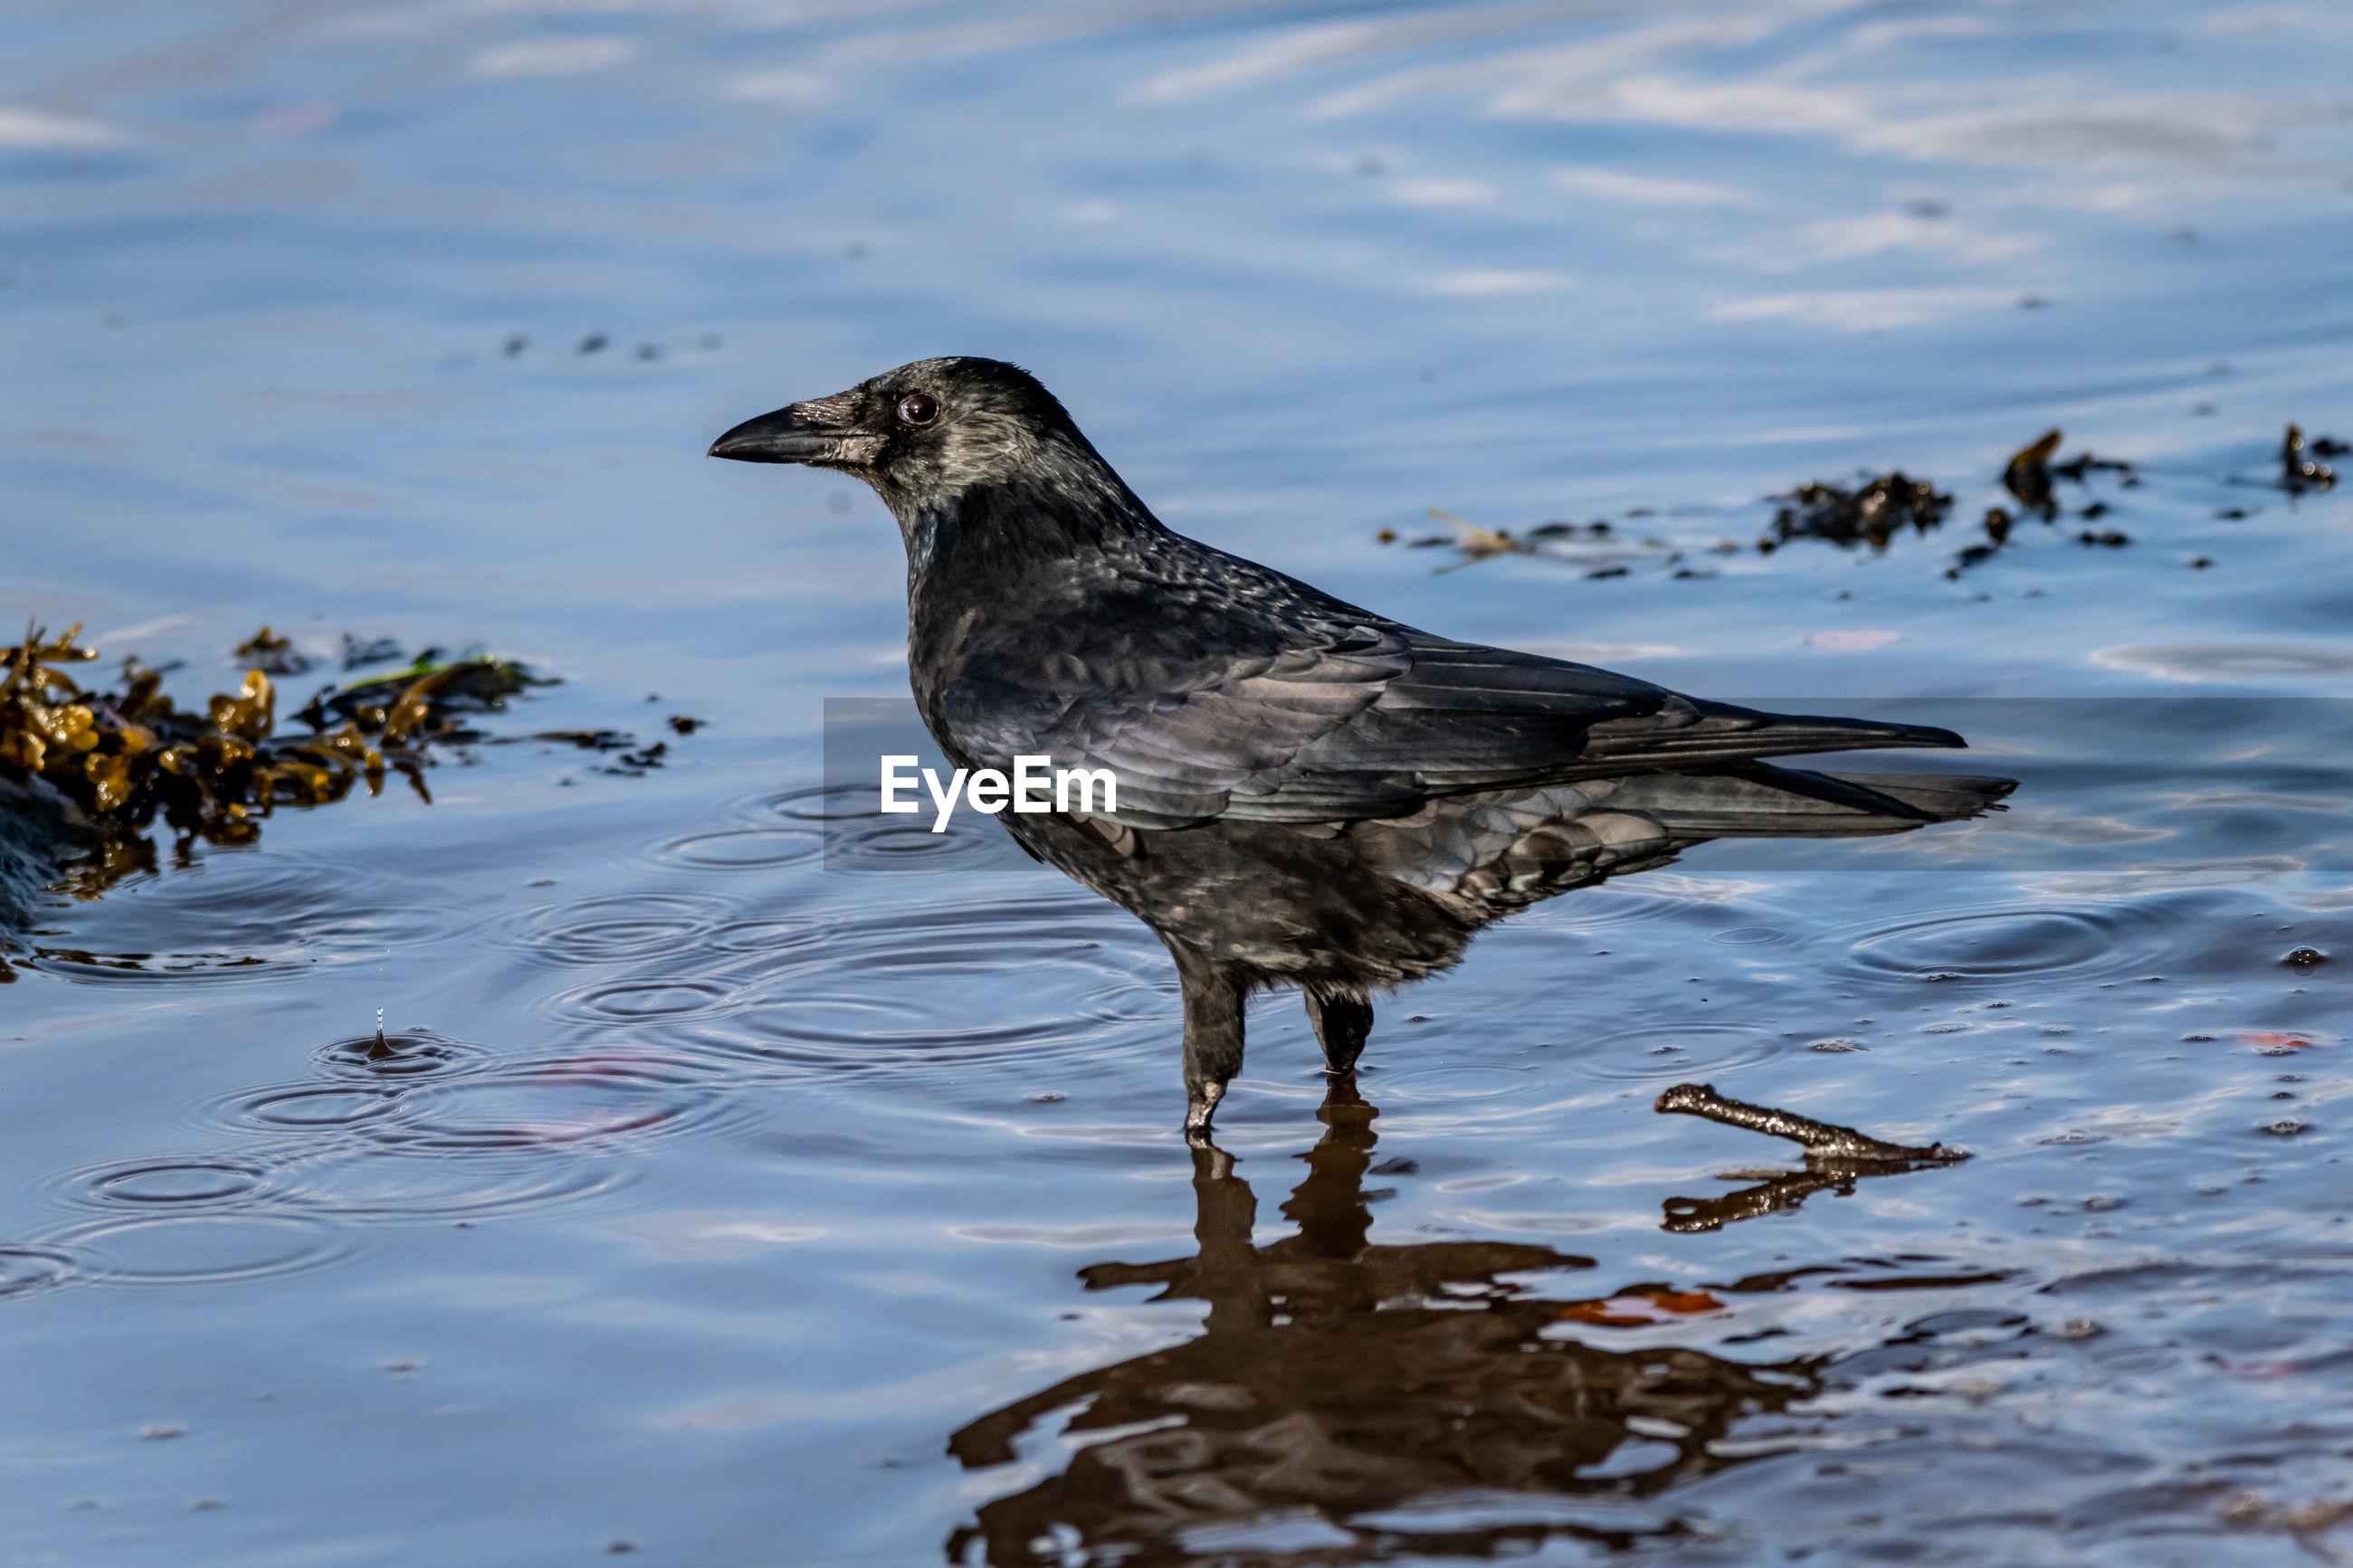 Crow perching at beach